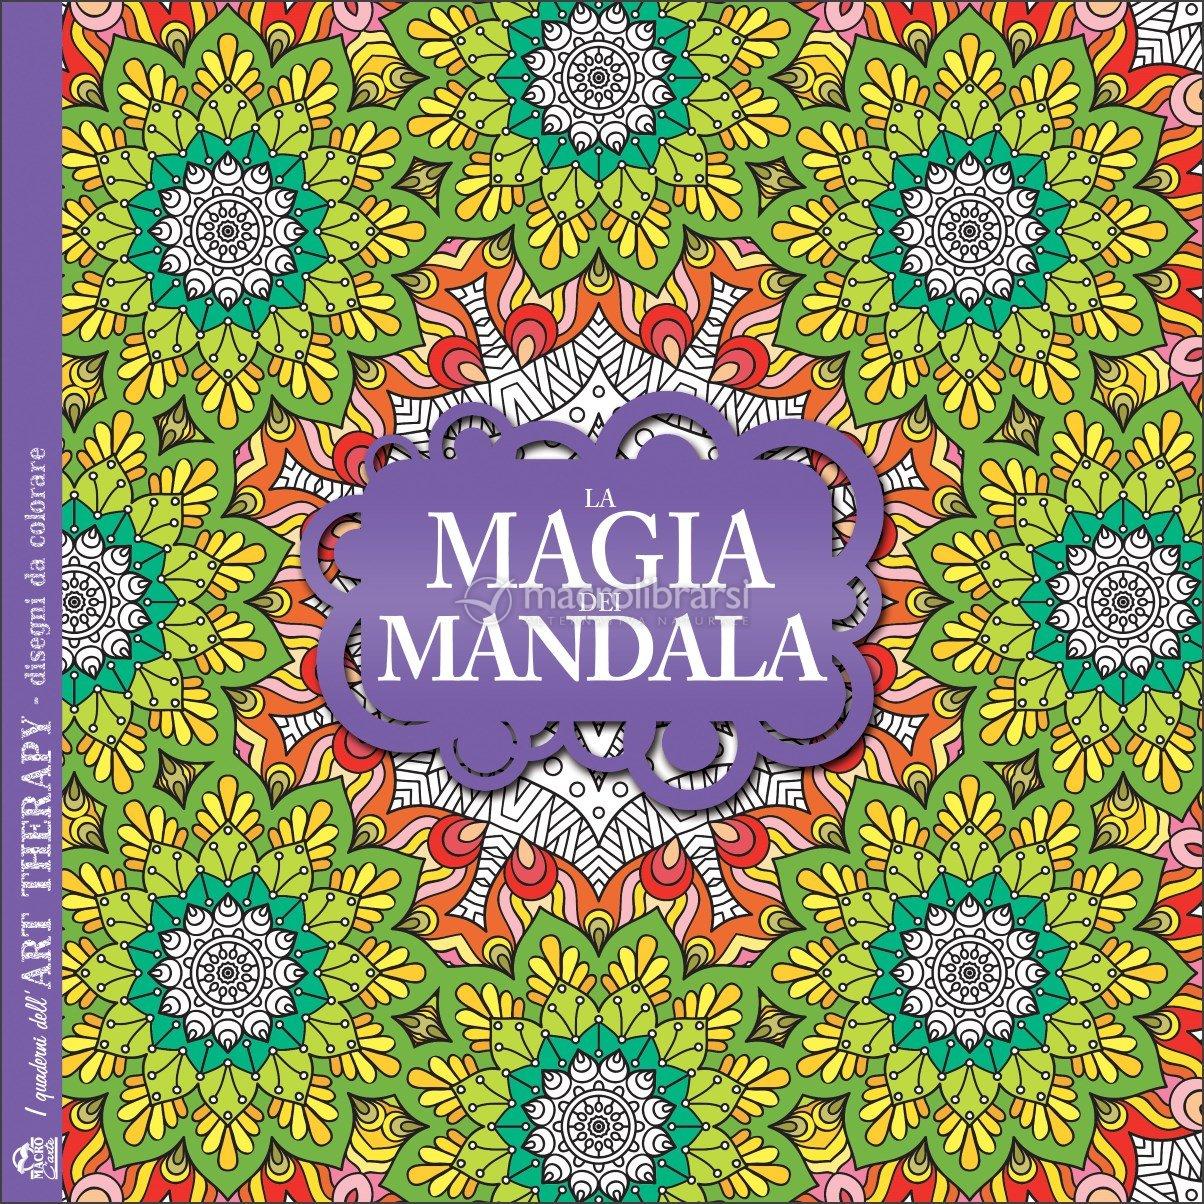 La Magia Dei Mandala Libro